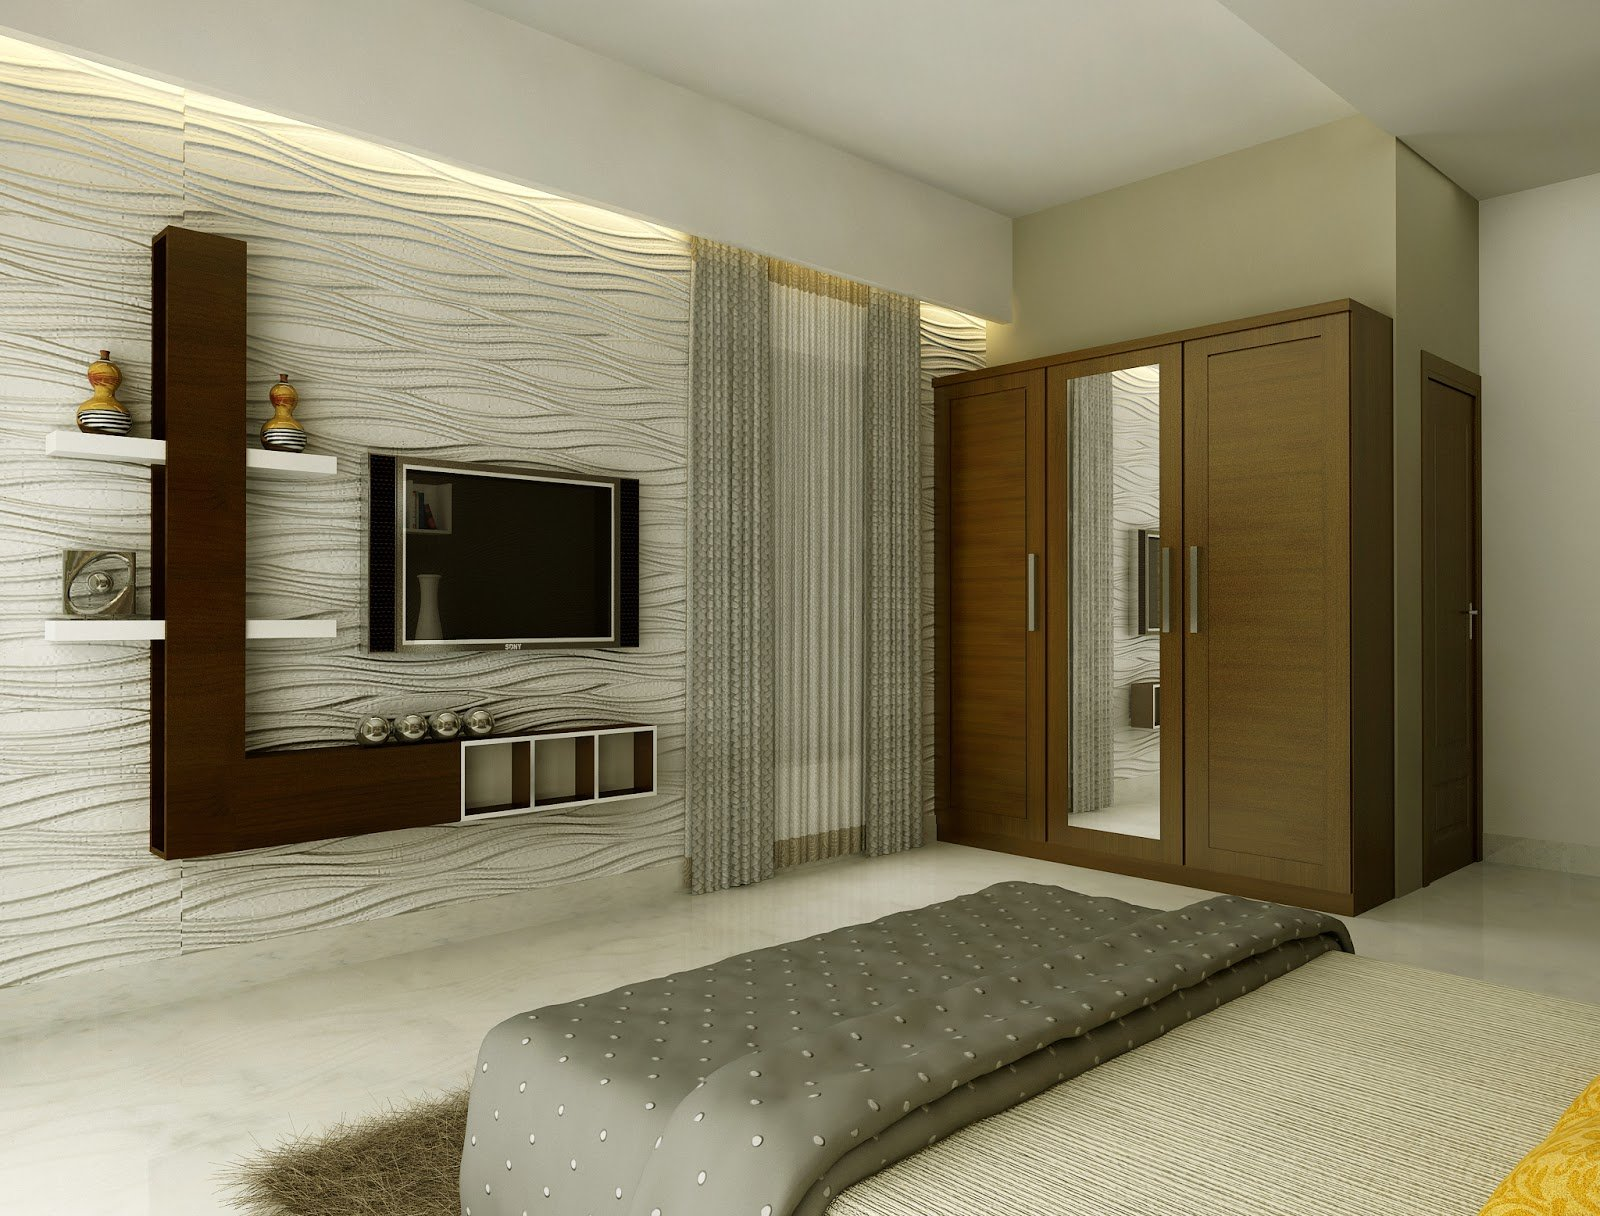 interior designhiasan dalamanhome designinspirasi dekorasi